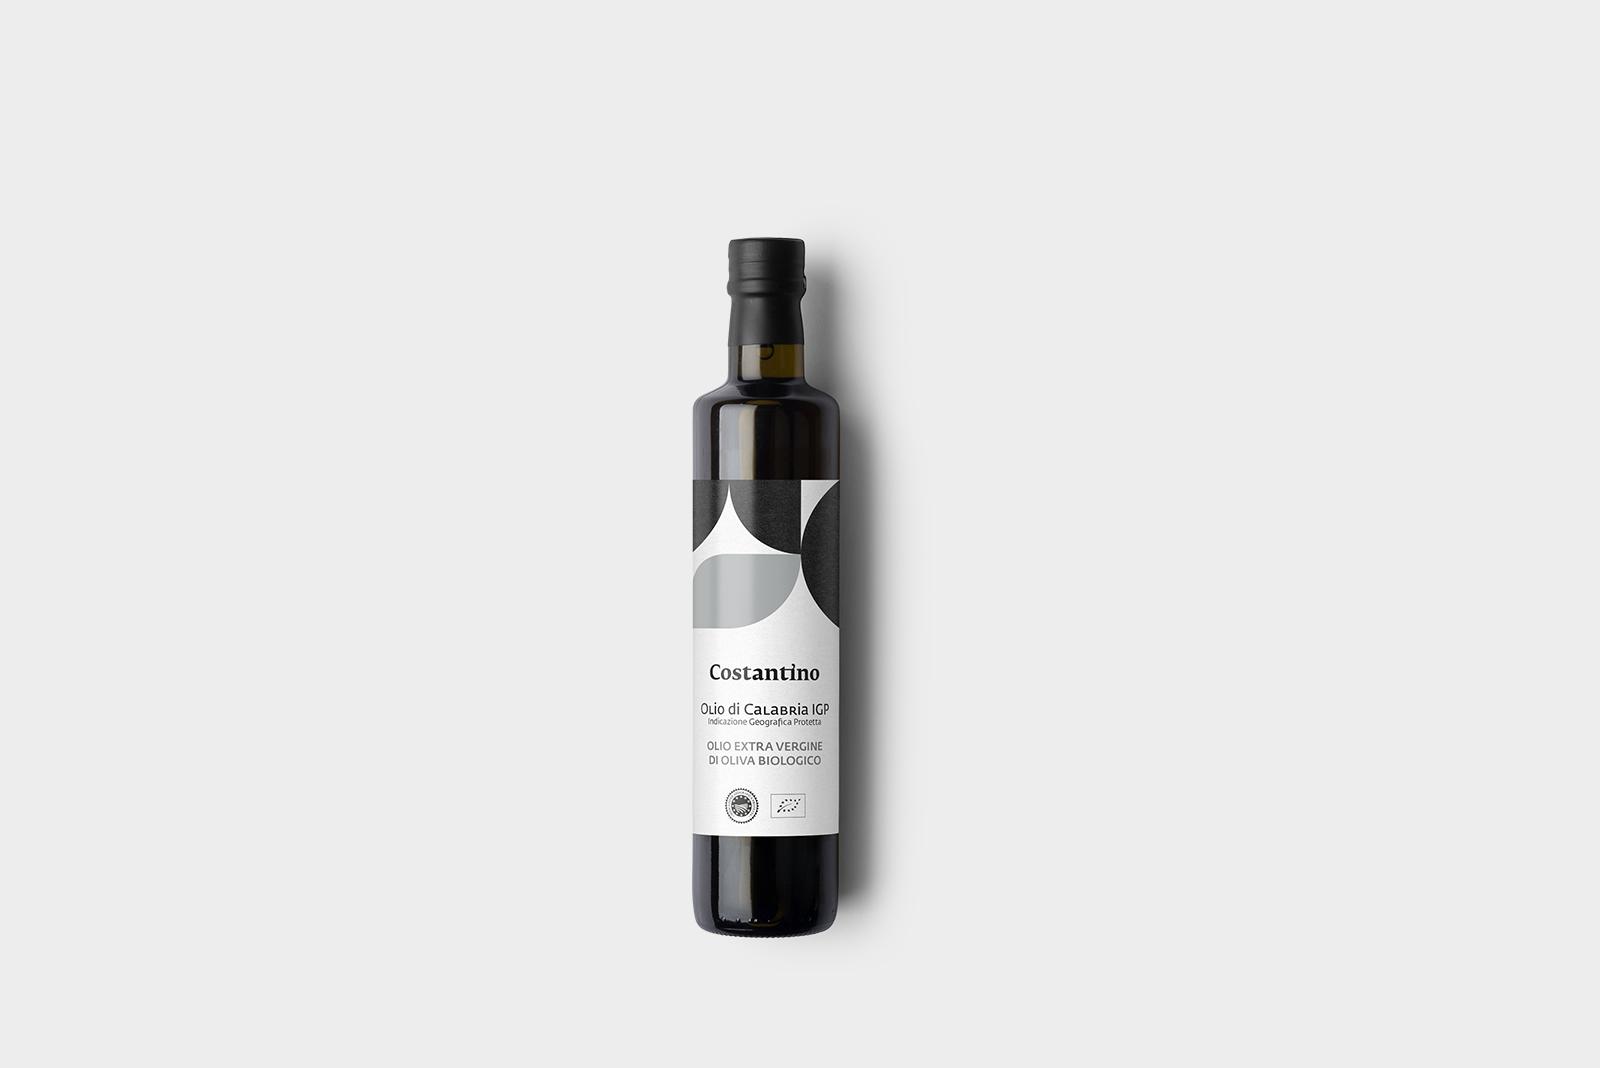 Costantino - Olio Extra Vergine d'Oliva Biologico IGP Calabria - bottiglia 25cl